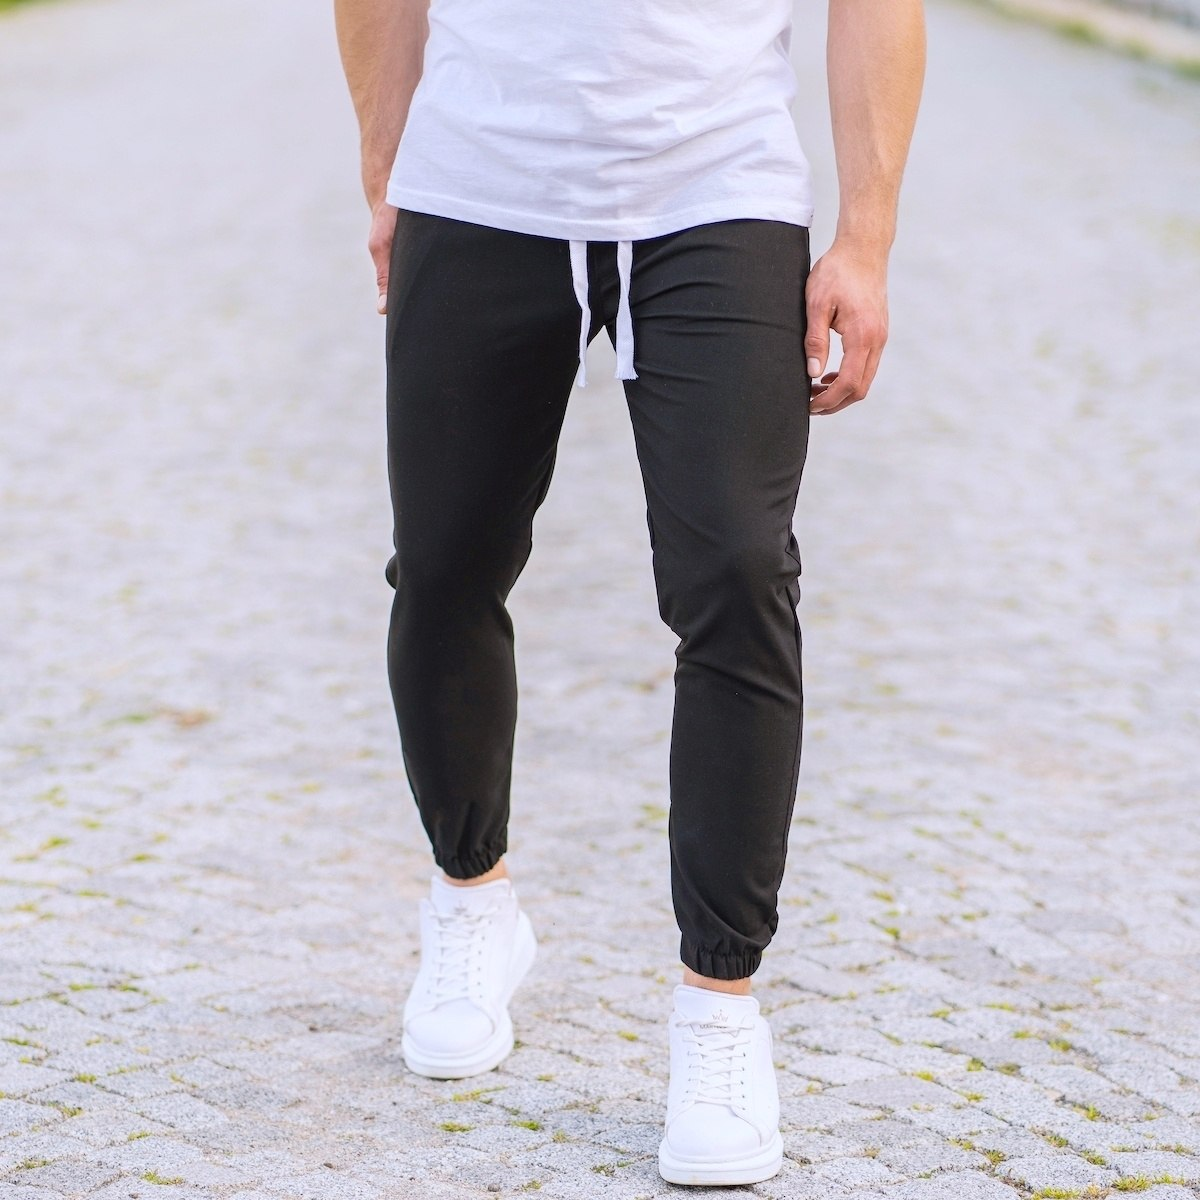 Men's Basic Elasticated Sport Pants Solid Black